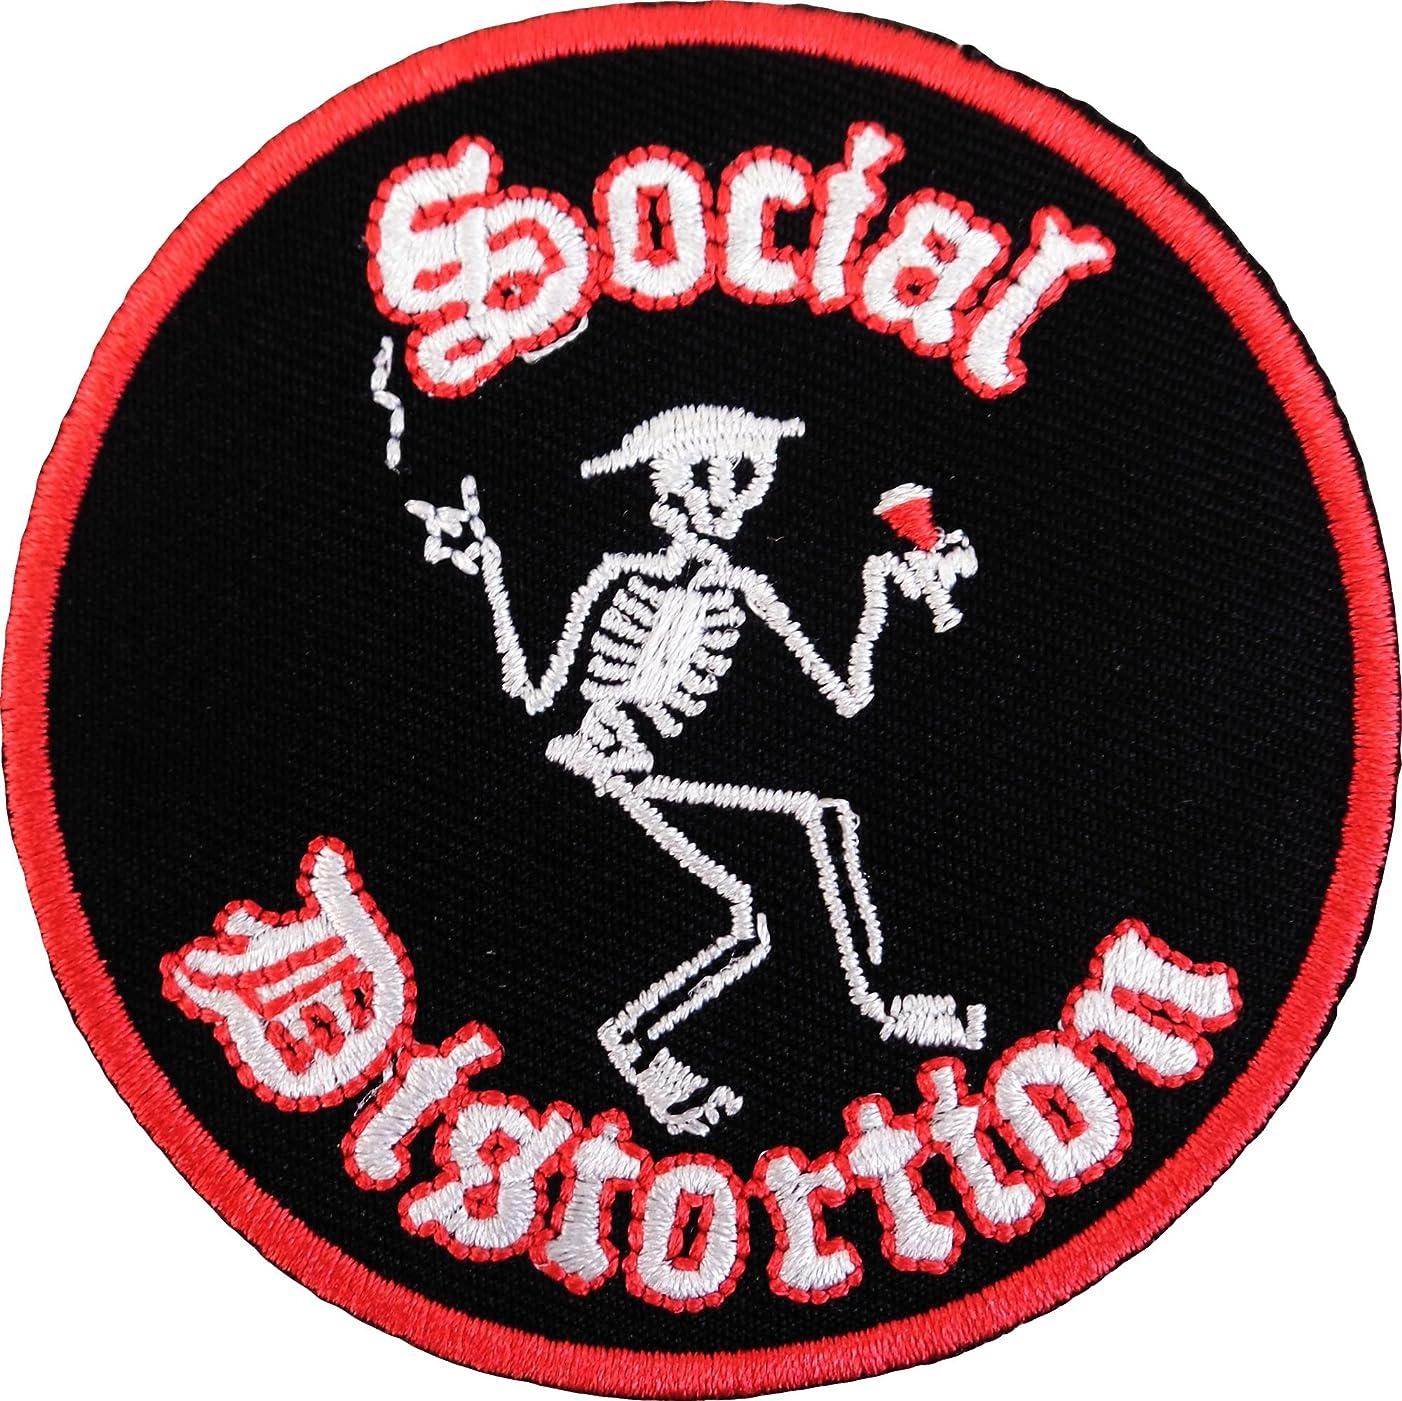 Social Distortion Skeleton Logo Rock Music Iron On Patch p747